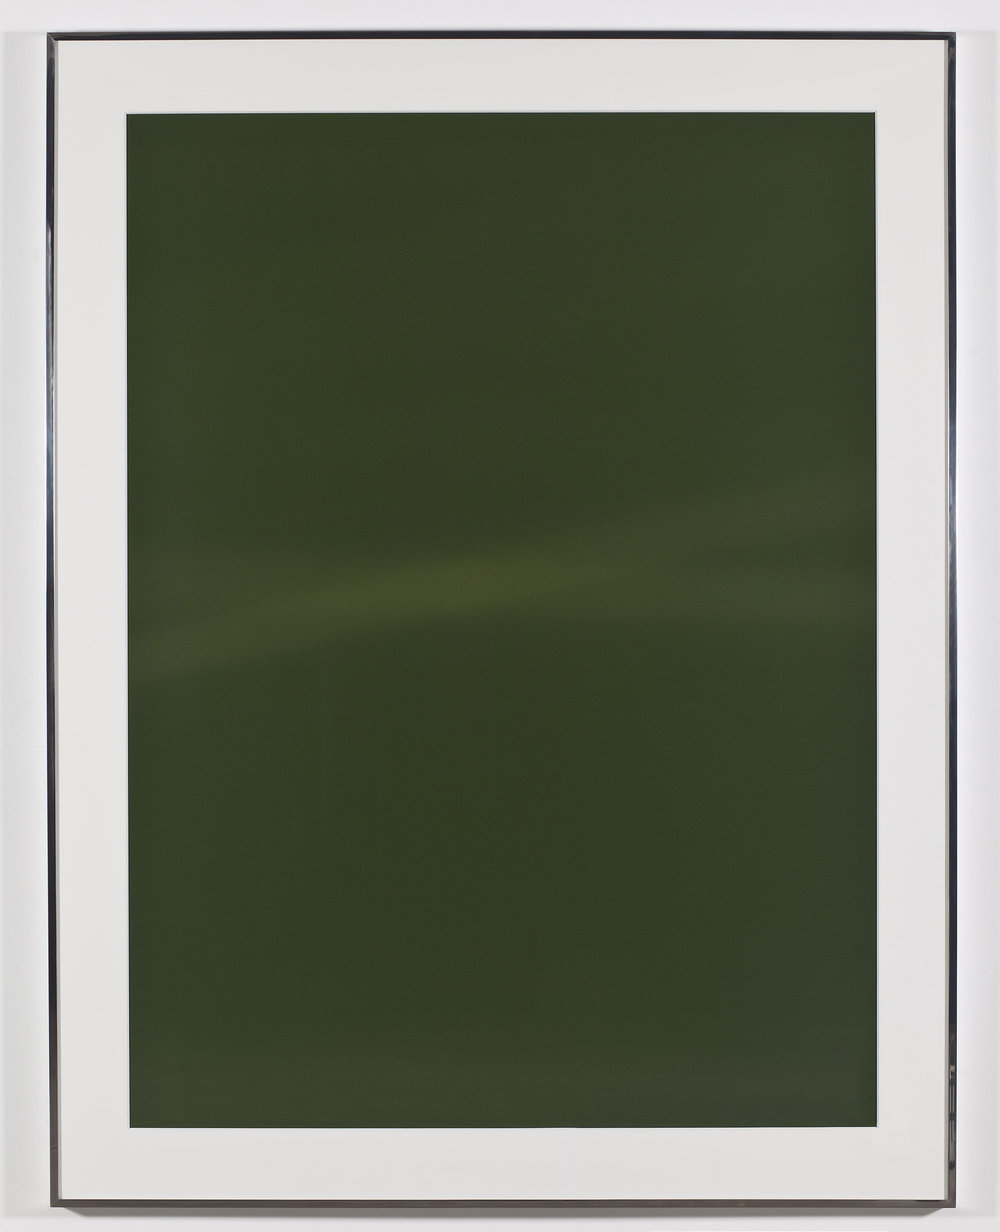 Transparency (Positive) [Fujichrome RDPIII Provia 100F Em. No. 05481: January 11–15, 2011 LAX/IAD/ZRH ZRH/IAD/LAX]   2011  Epson Ultrachrome K3 archival ink jet print on Museo Silver Rag Paper  68 x 52 1/4 inches   Transparencies, 2008–2014    Diapositives, 2011